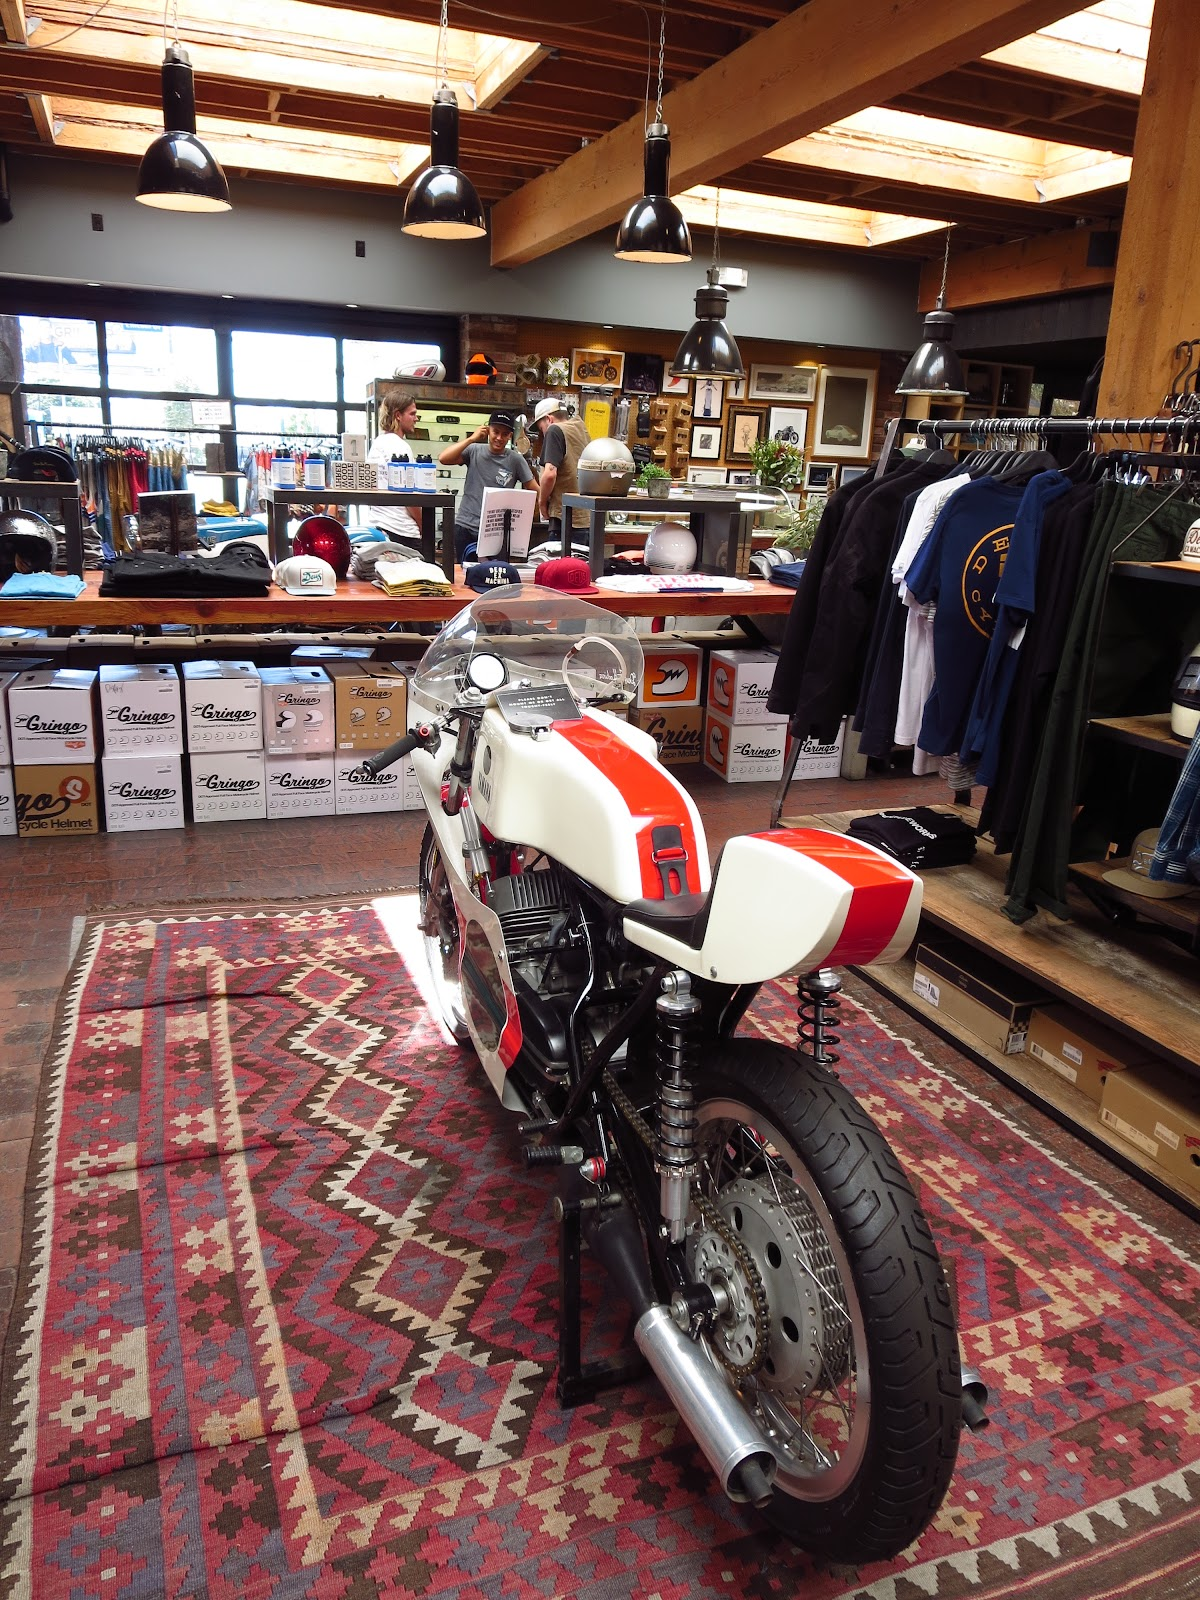 oddbike oddbike usa tour 2015 part ix don 39 t buy the hype. Black Bedroom Furniture Sets. Home Design Ideas